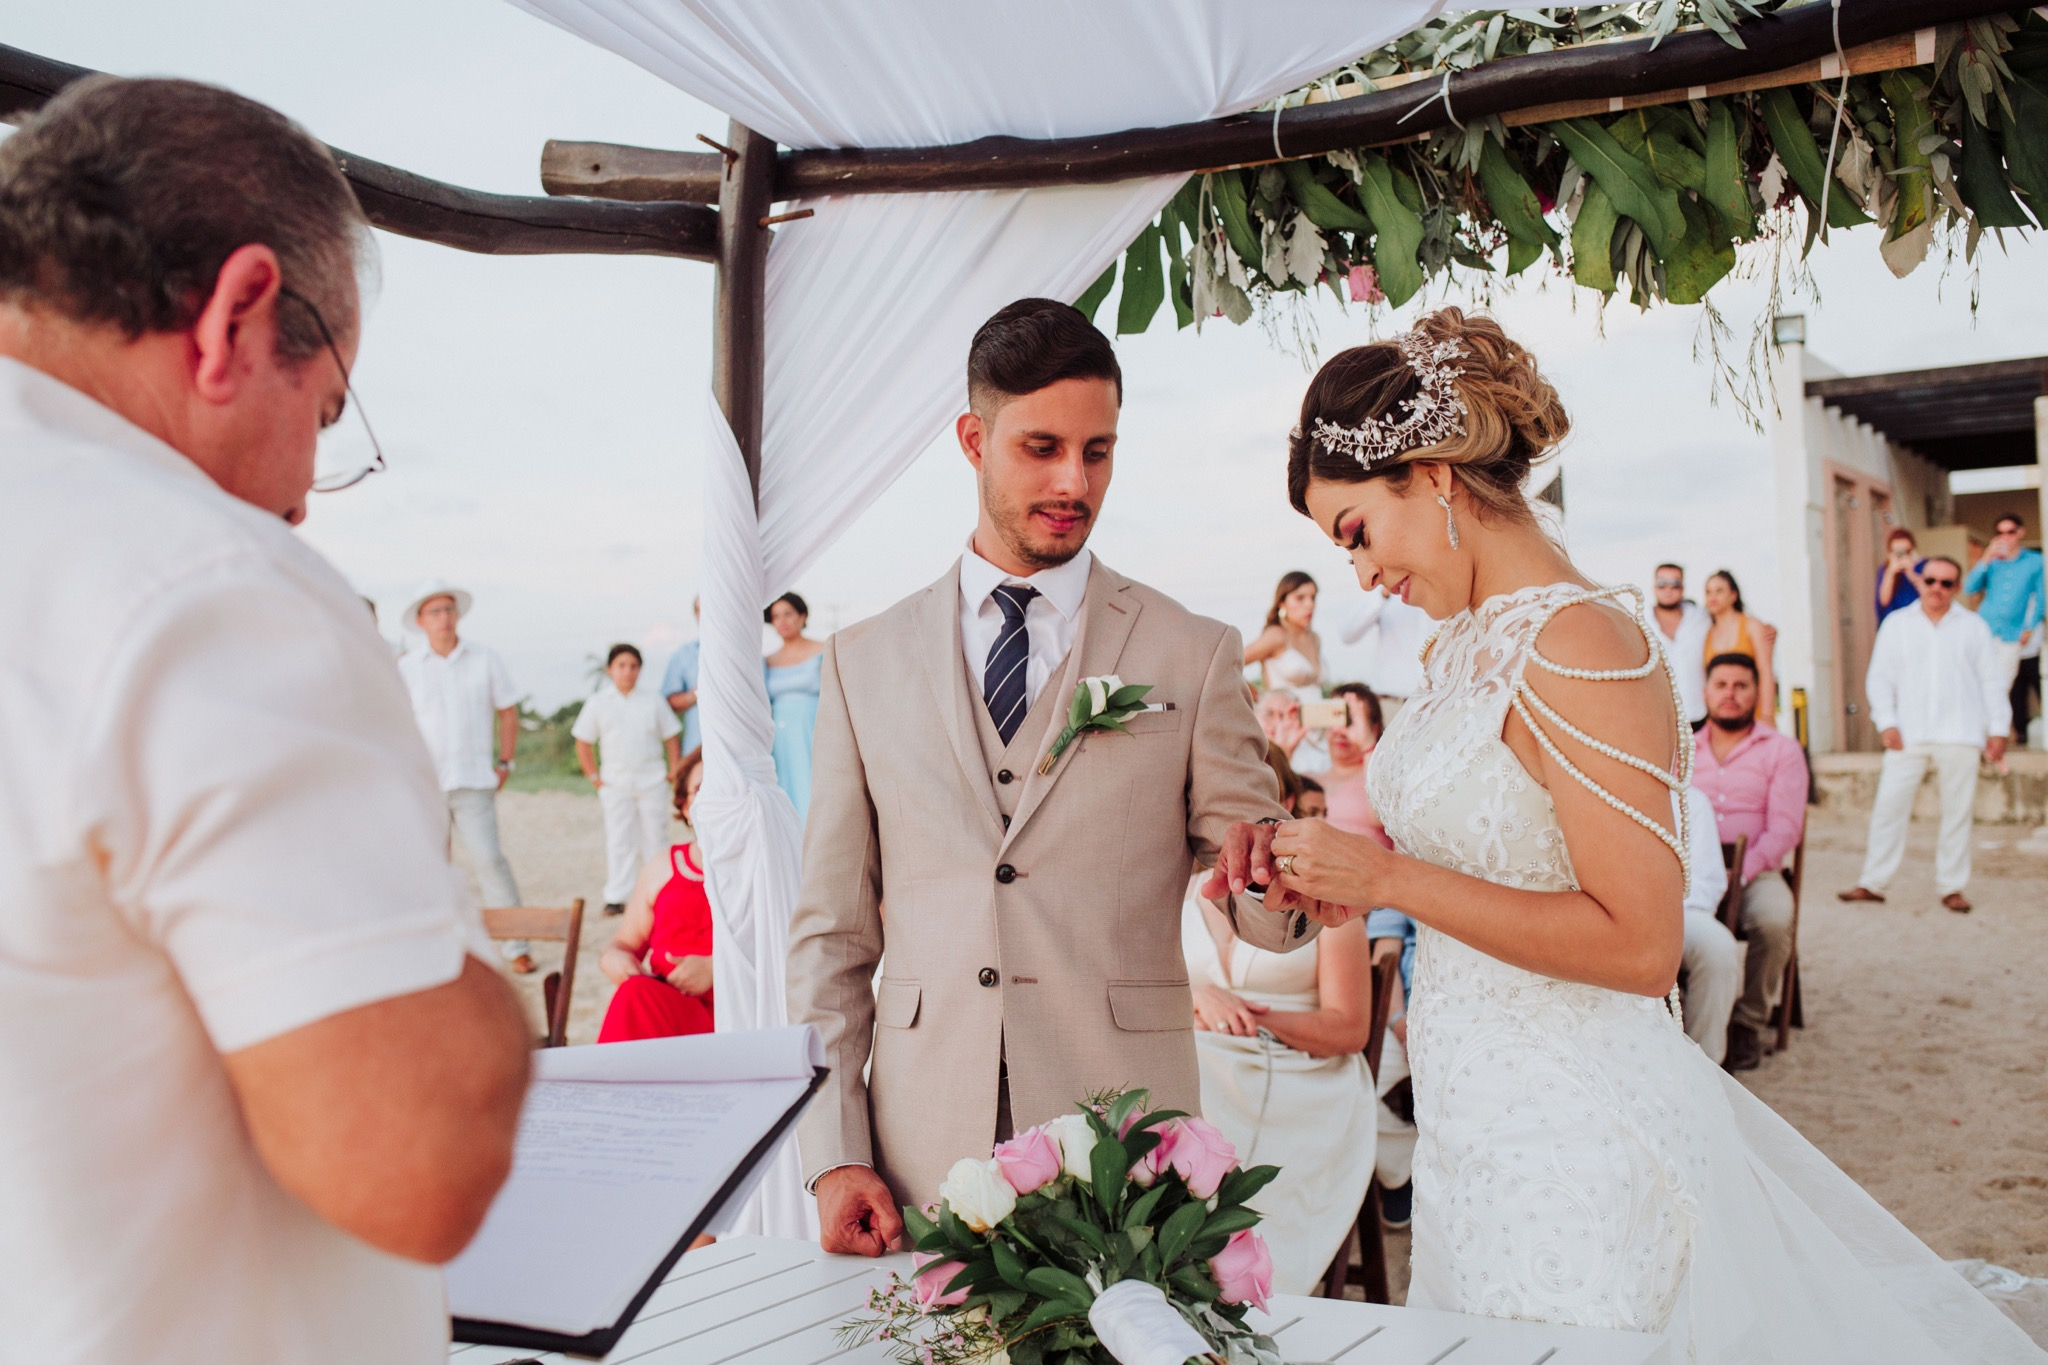 Javier_noriega_fotografo_bodas_profesional_zacatecas_mexico_mazatlan_sinaloa_photographer_weddings62